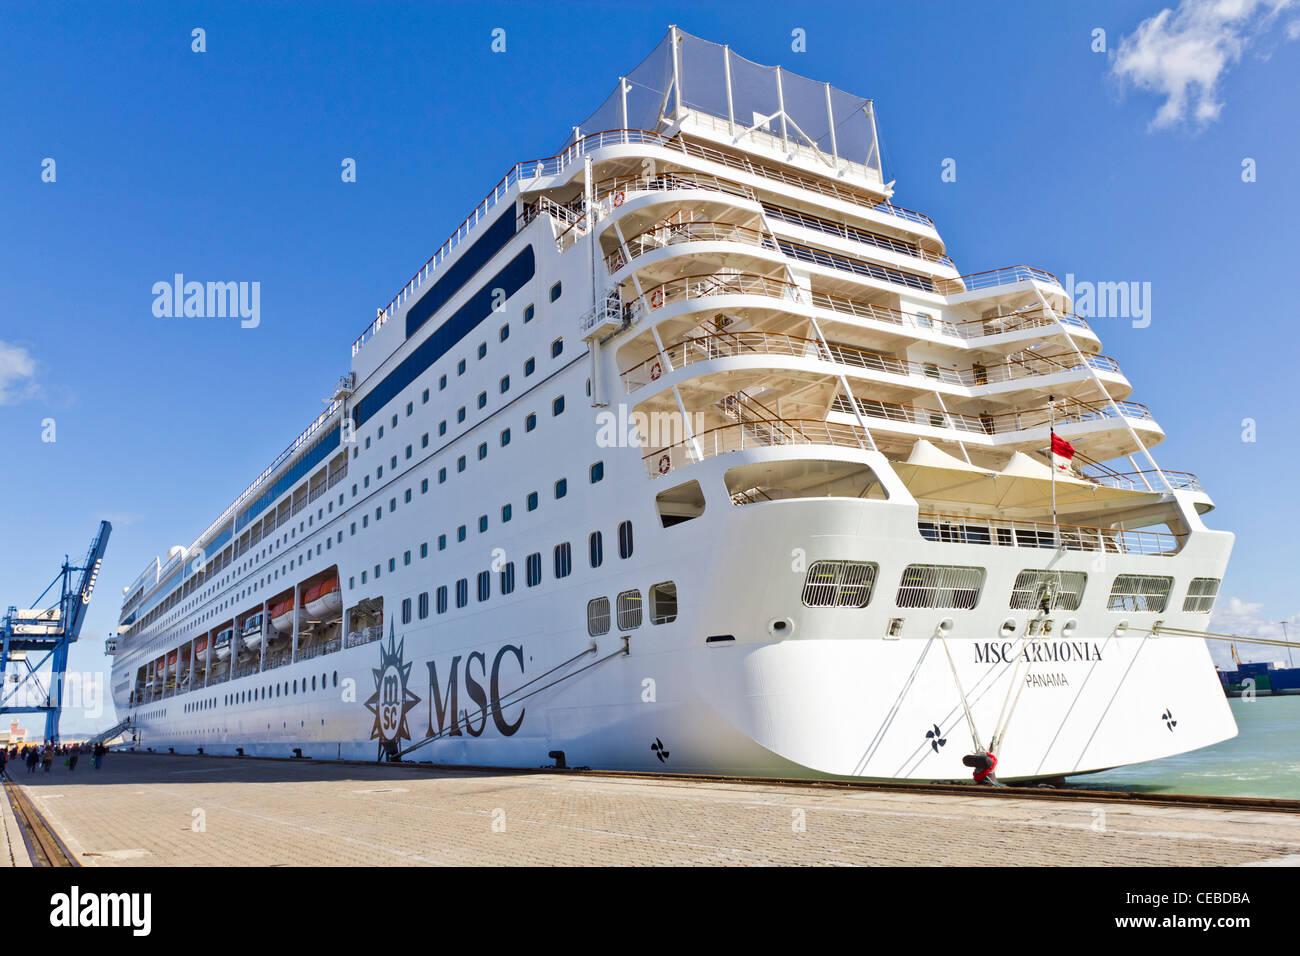 MSC Armonia Cruise Ship Docked At Cadiz Spain Stock Photo - Msc armonia